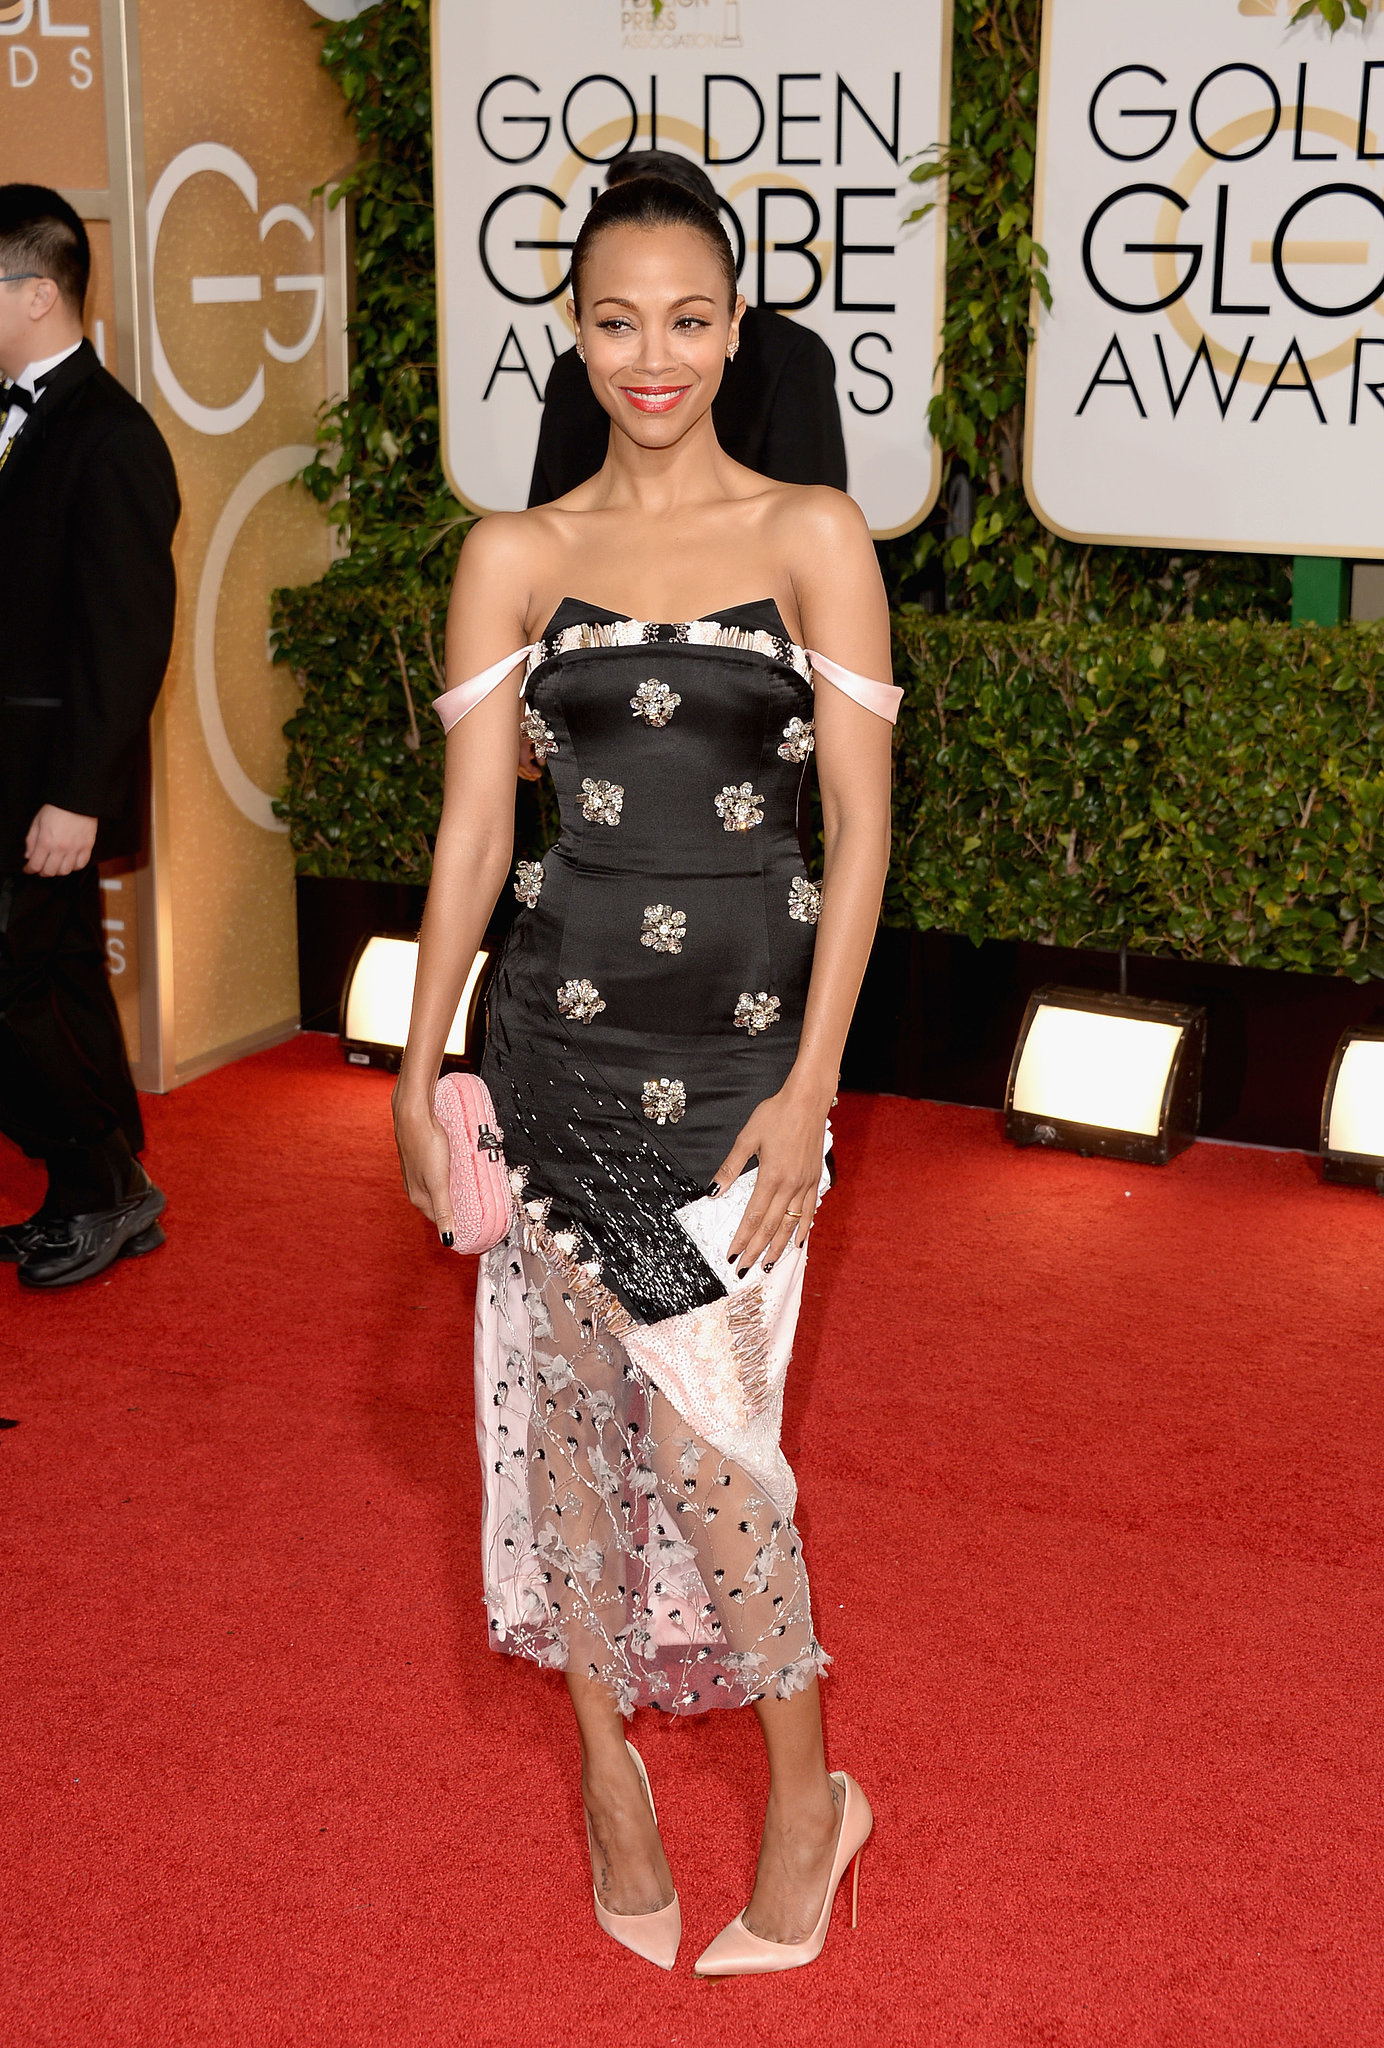 Zoe Saldana took a style risk in her Prabal Gurung gown.